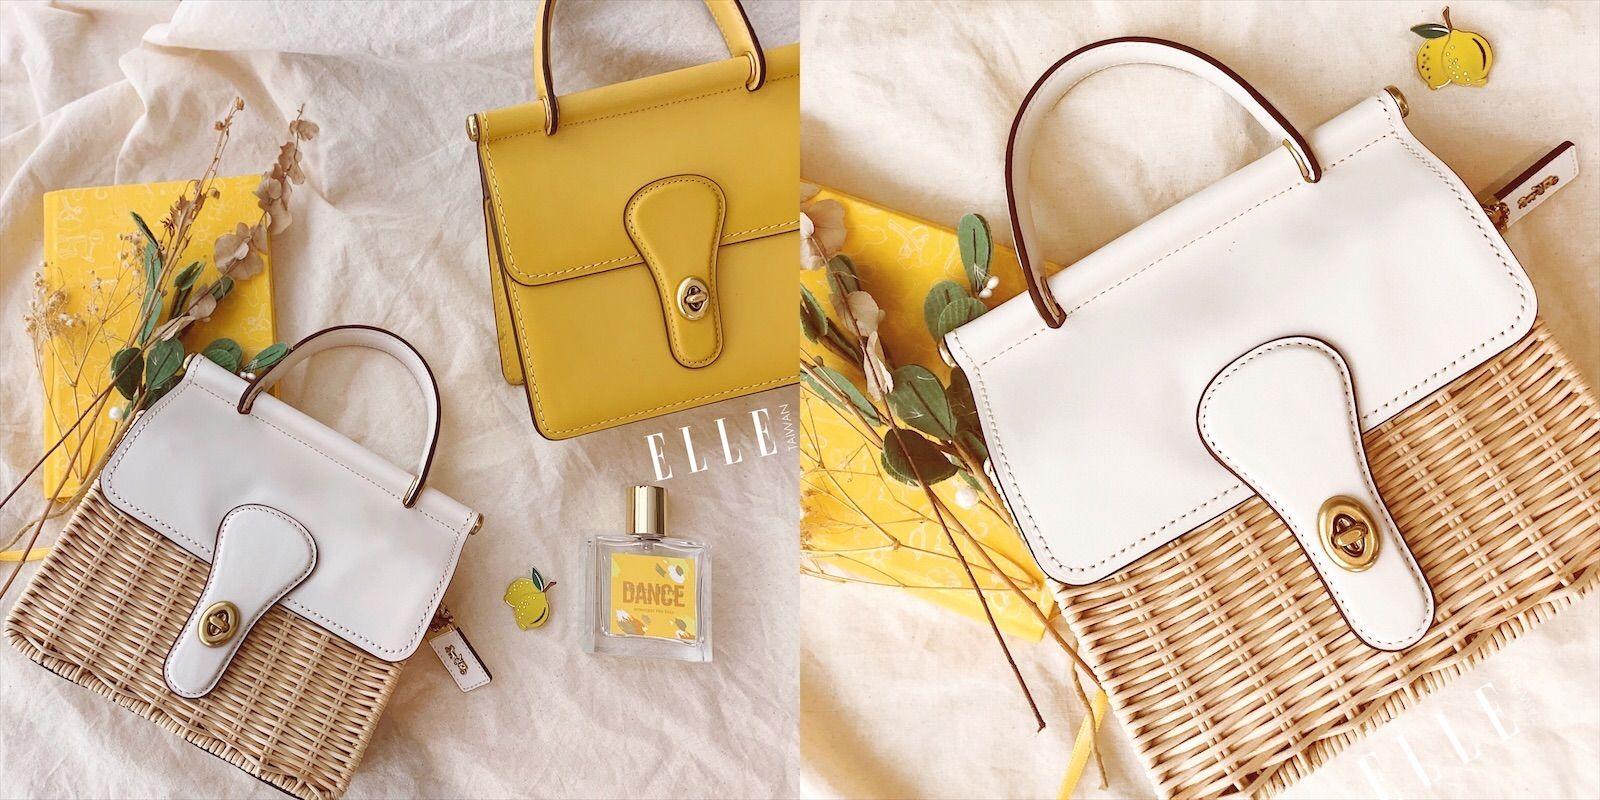 COACH 推出 Willis 18 手提包復古小包太可愛!檸檬黃,奶油白 多種粉彩配色 女生看了都心動